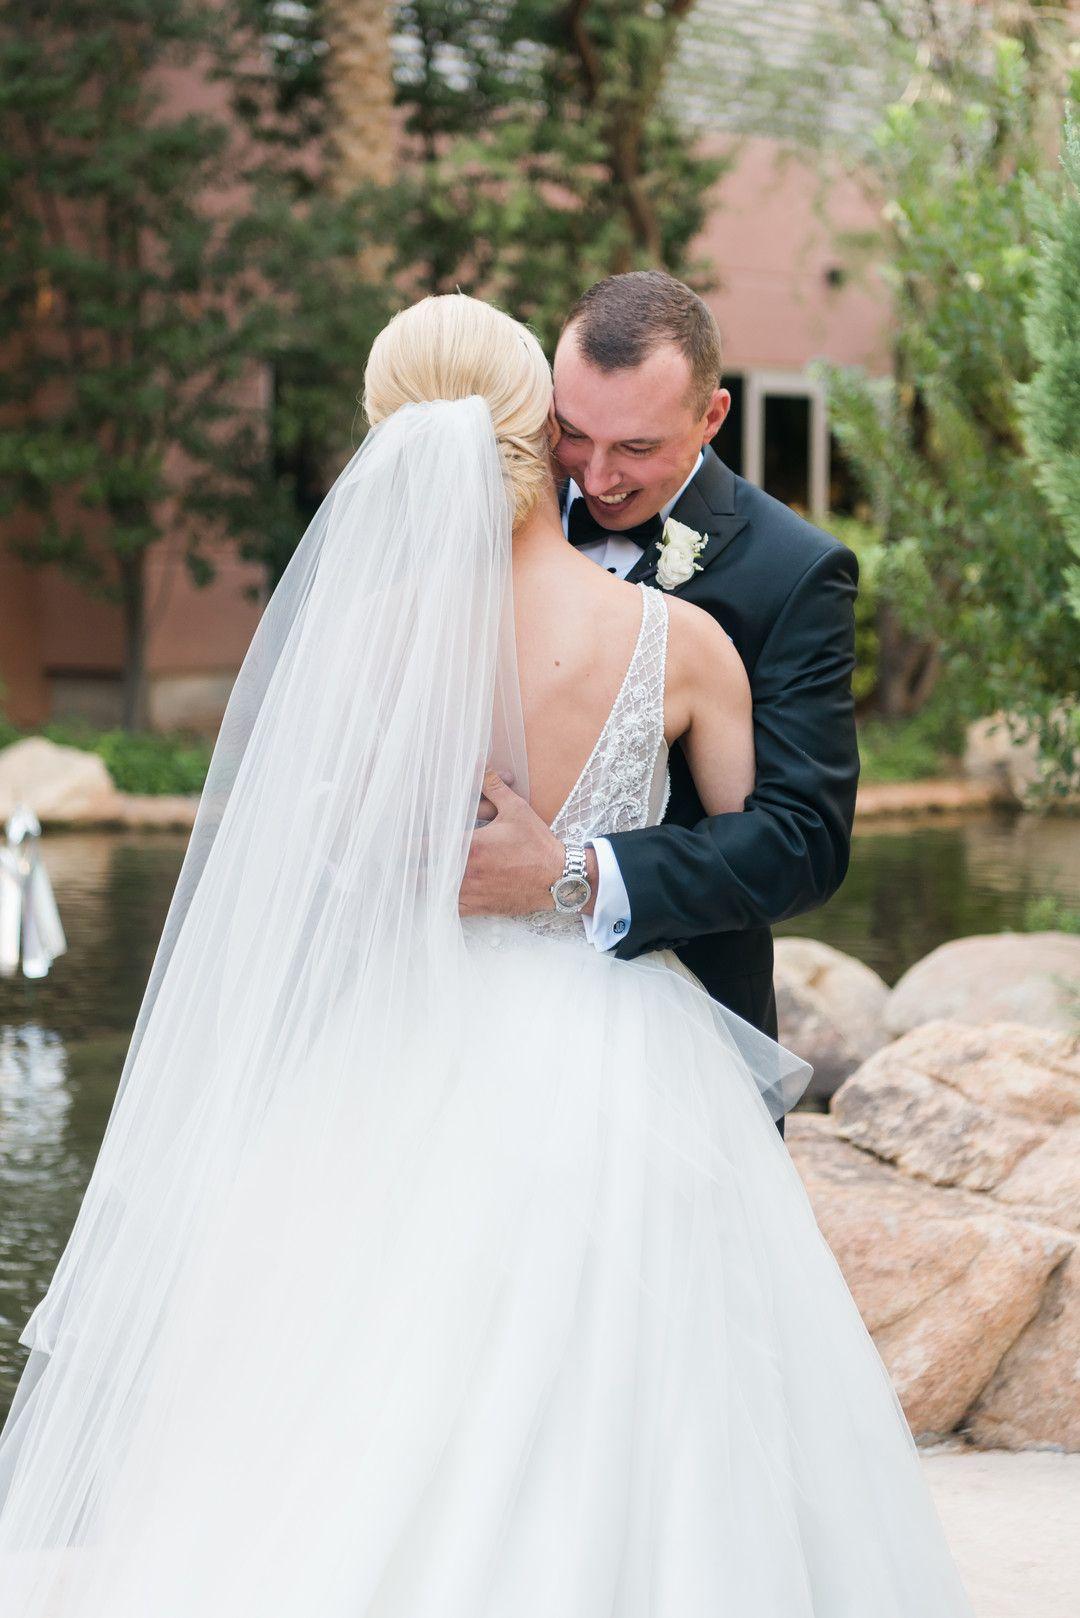 Timeless + Classic Las Vegas Wedding at the JW Marriott